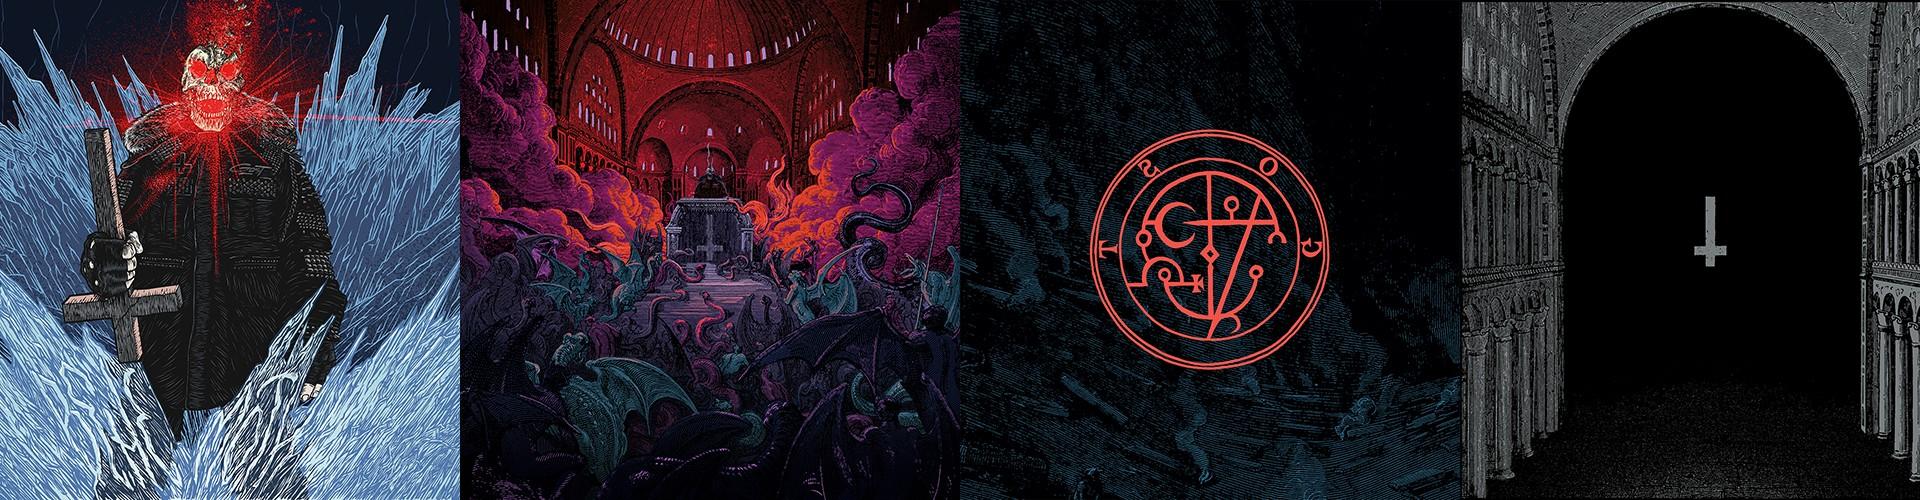 "GosT ""Behemoth"" + ""Non Paradisi"""